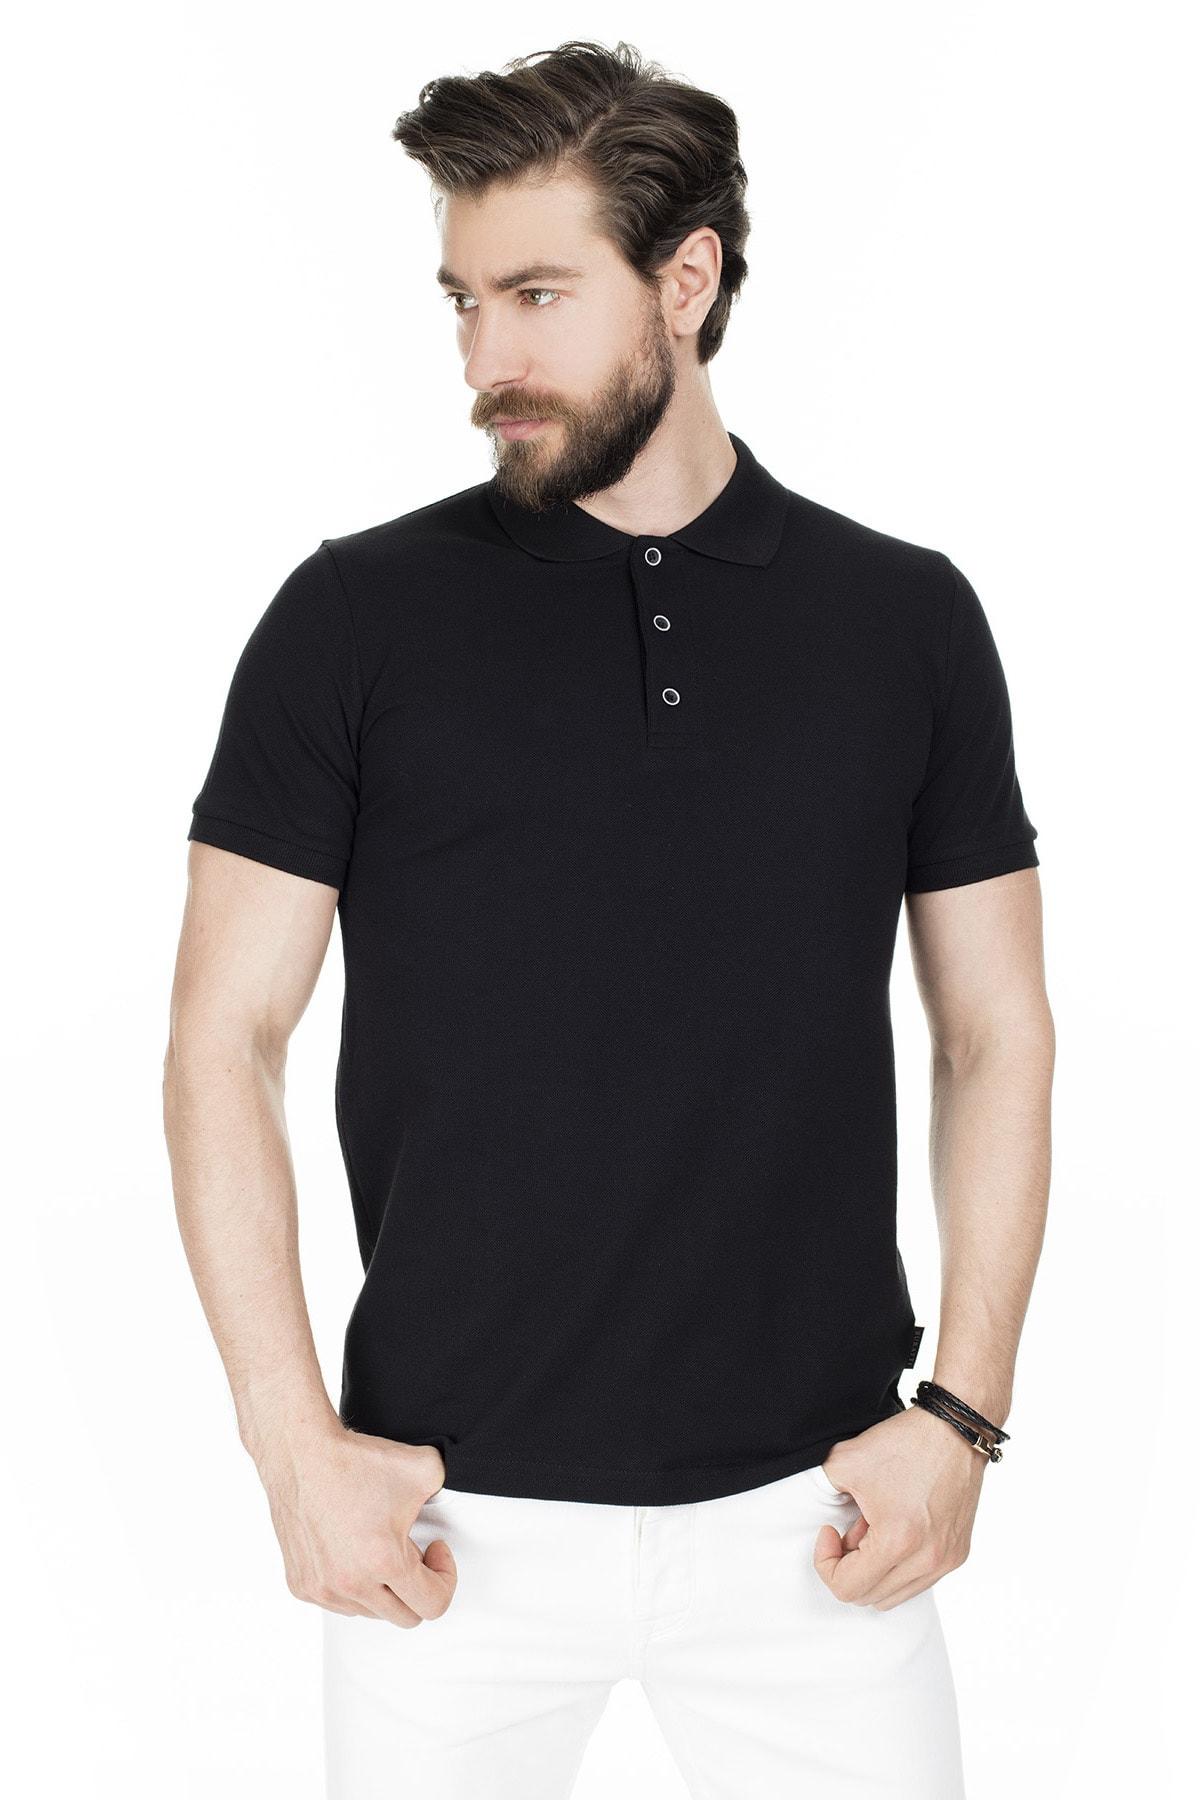 Buratti Erkek Siyah Düğmeli Polo Yaka Pamuklu Günlük T Shirt 4362050 0